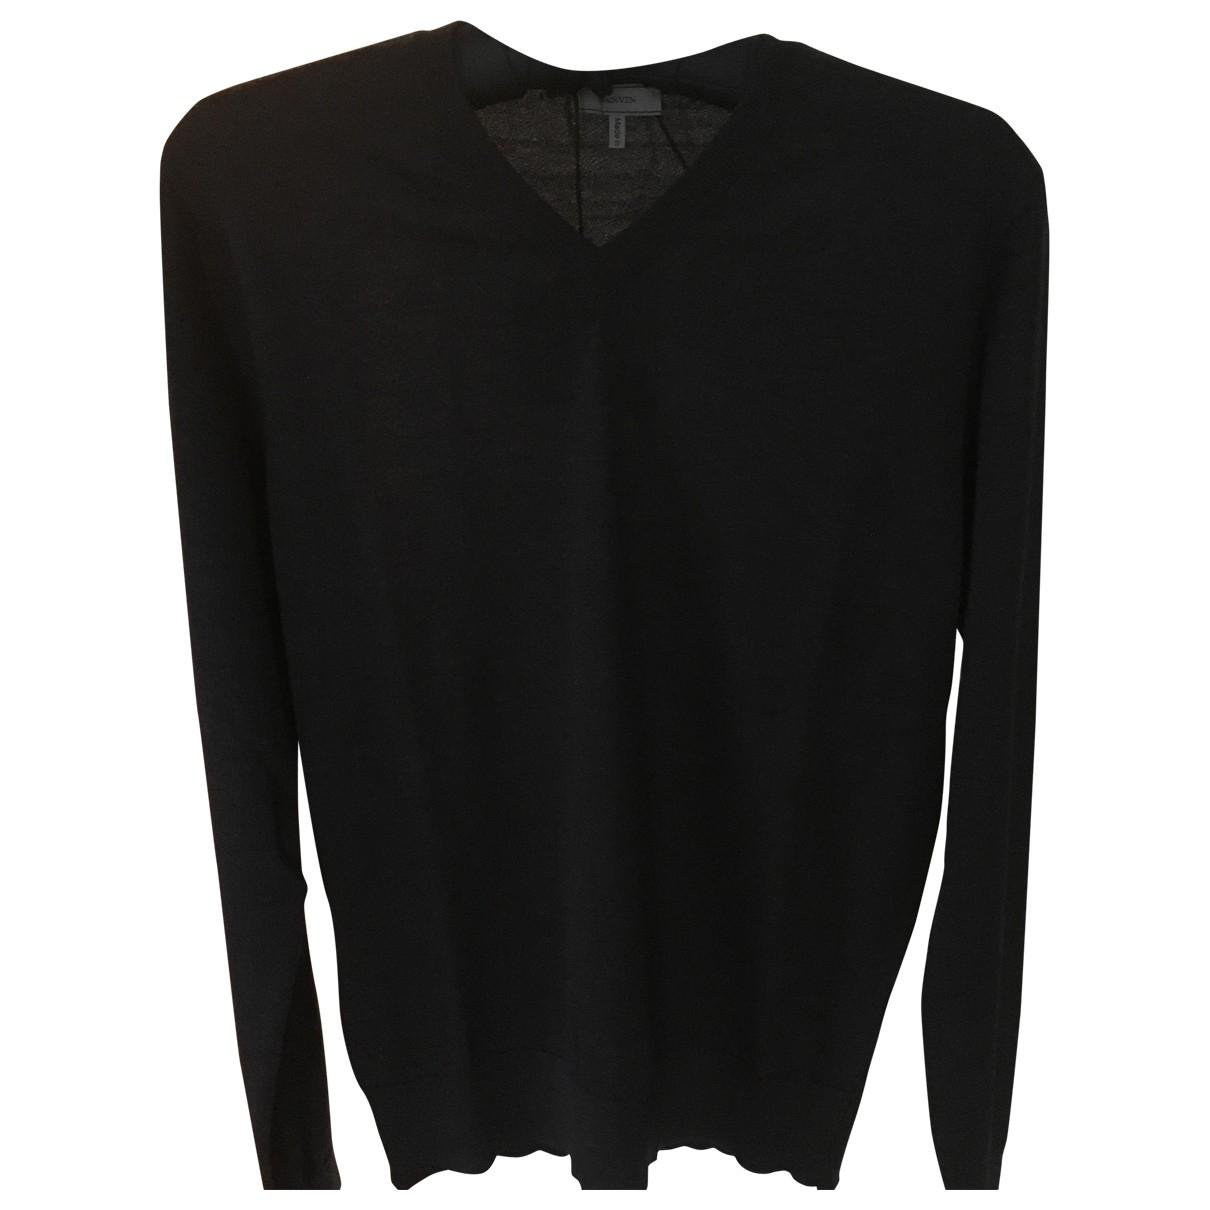 Lanvin \N Anthracite Cashmere Knitwear & Sweatshirts for Men S International